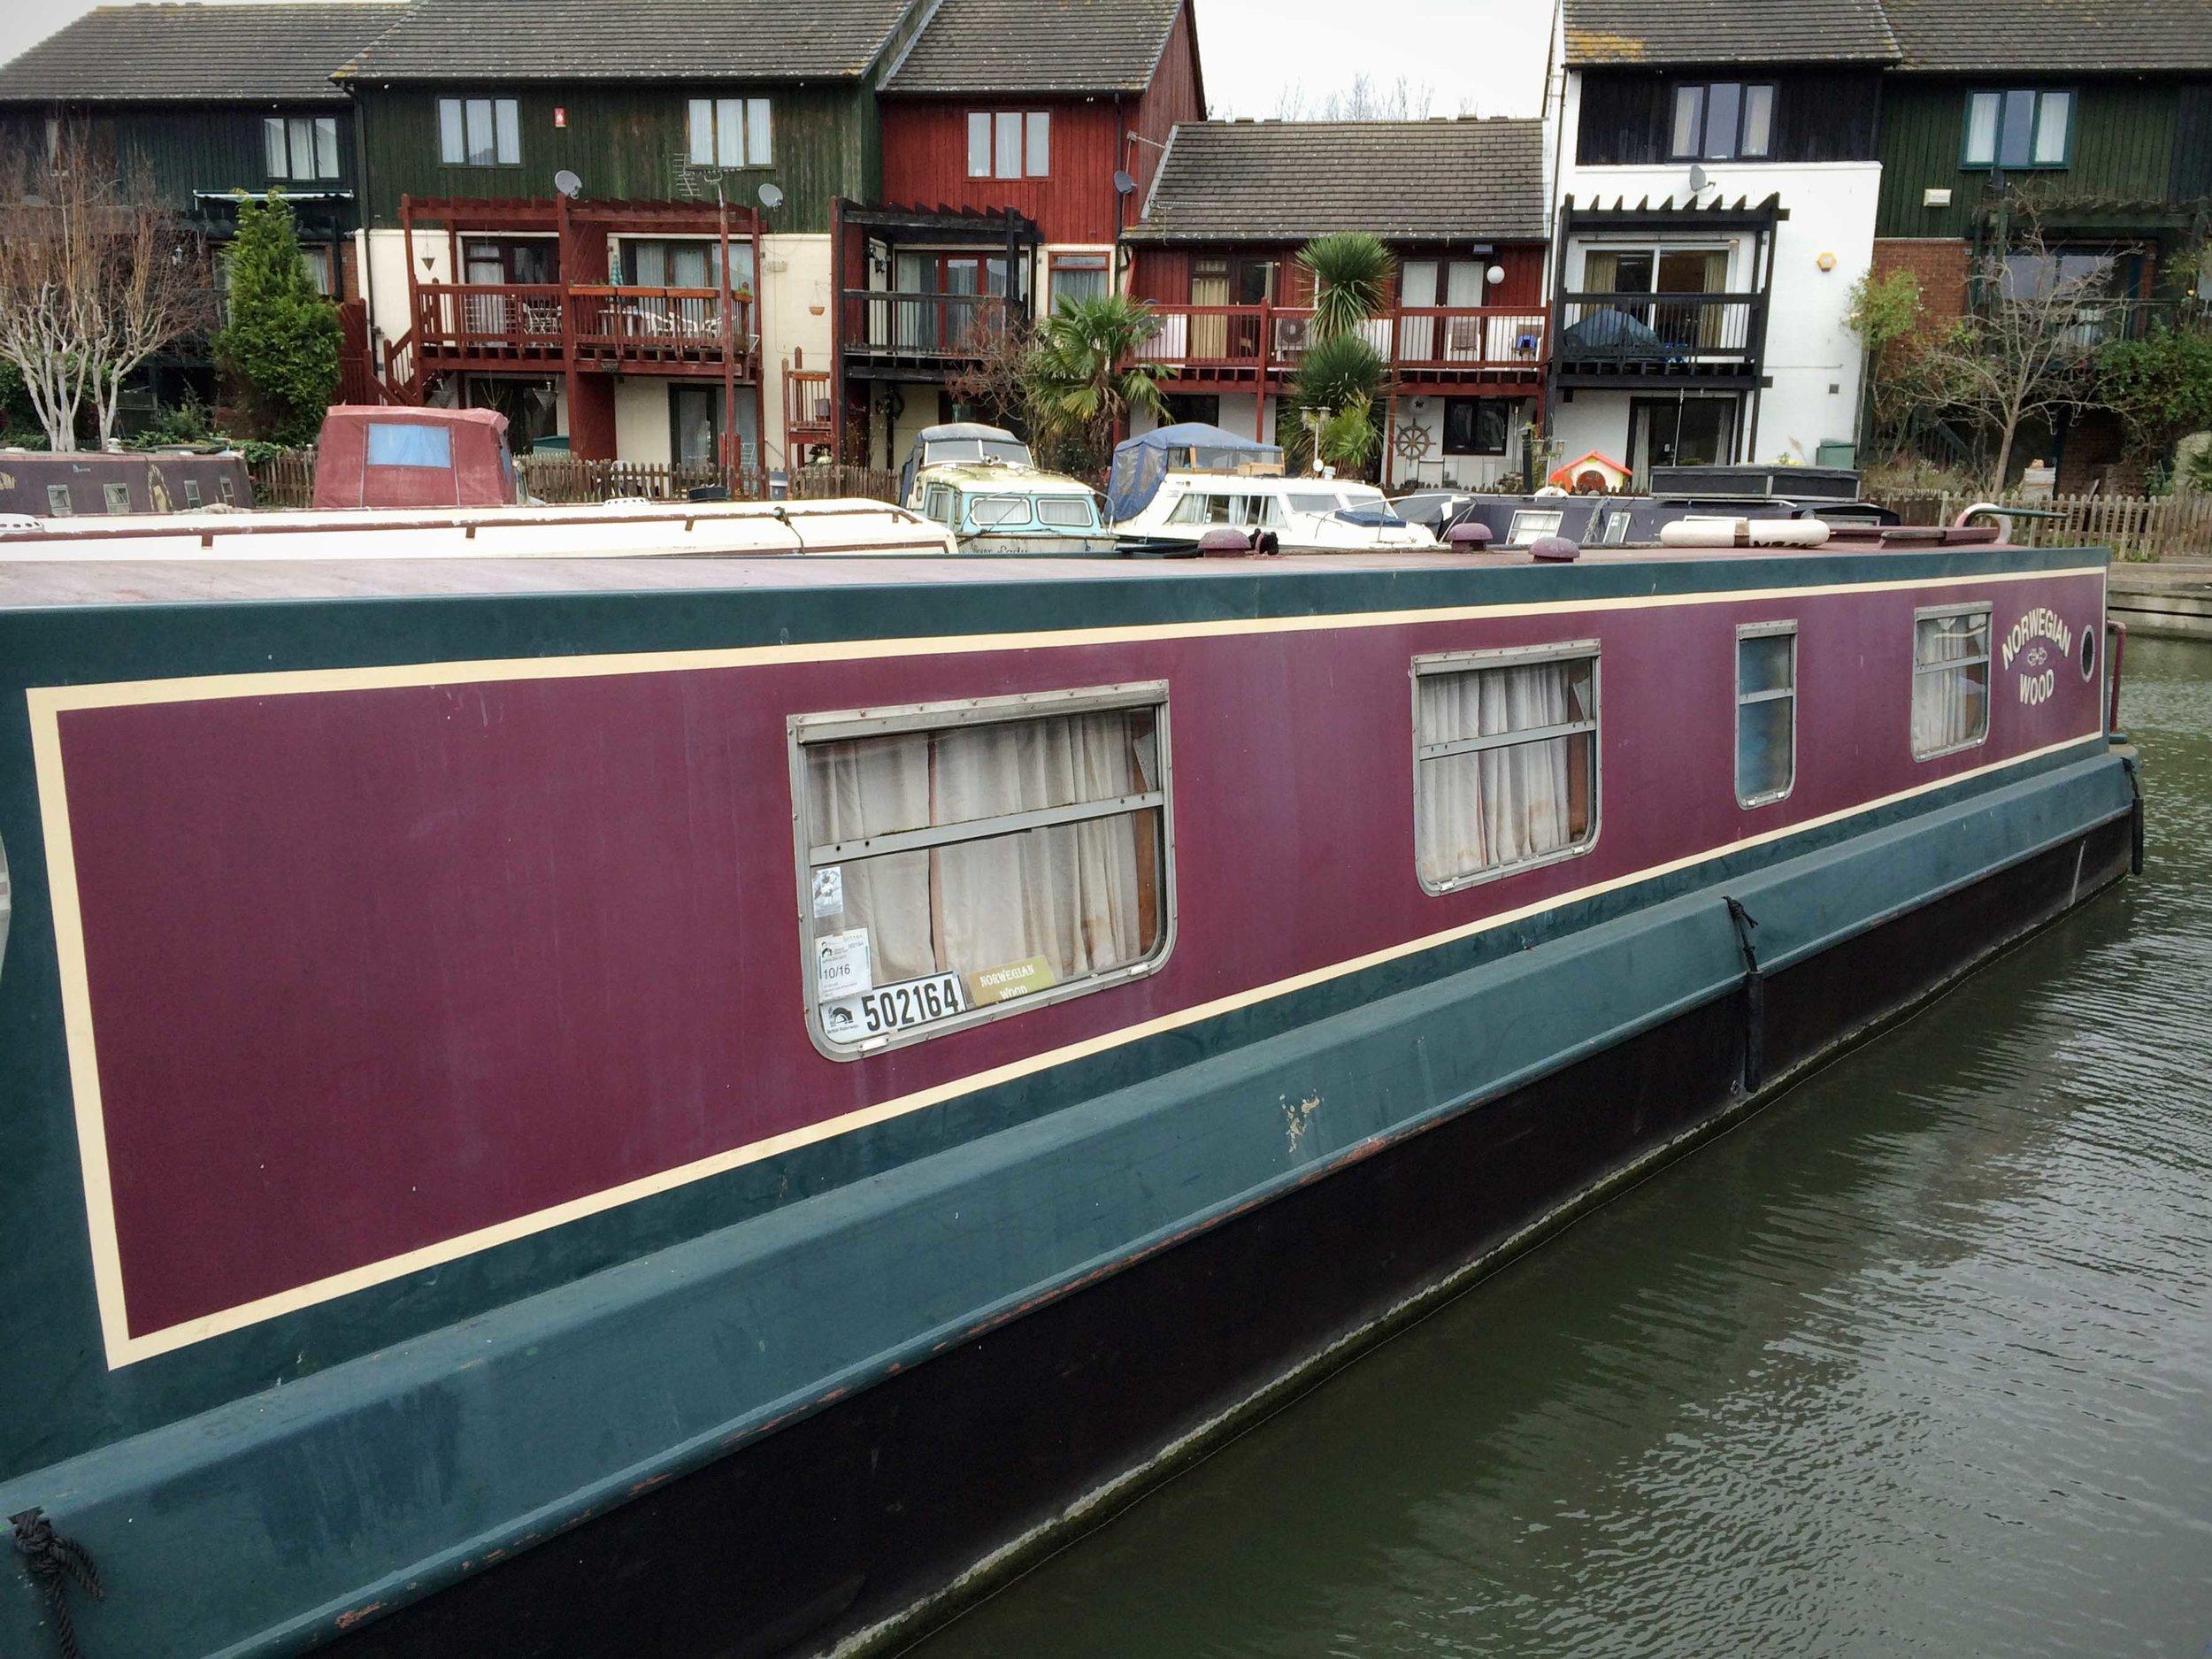 UK canal boat.jpg